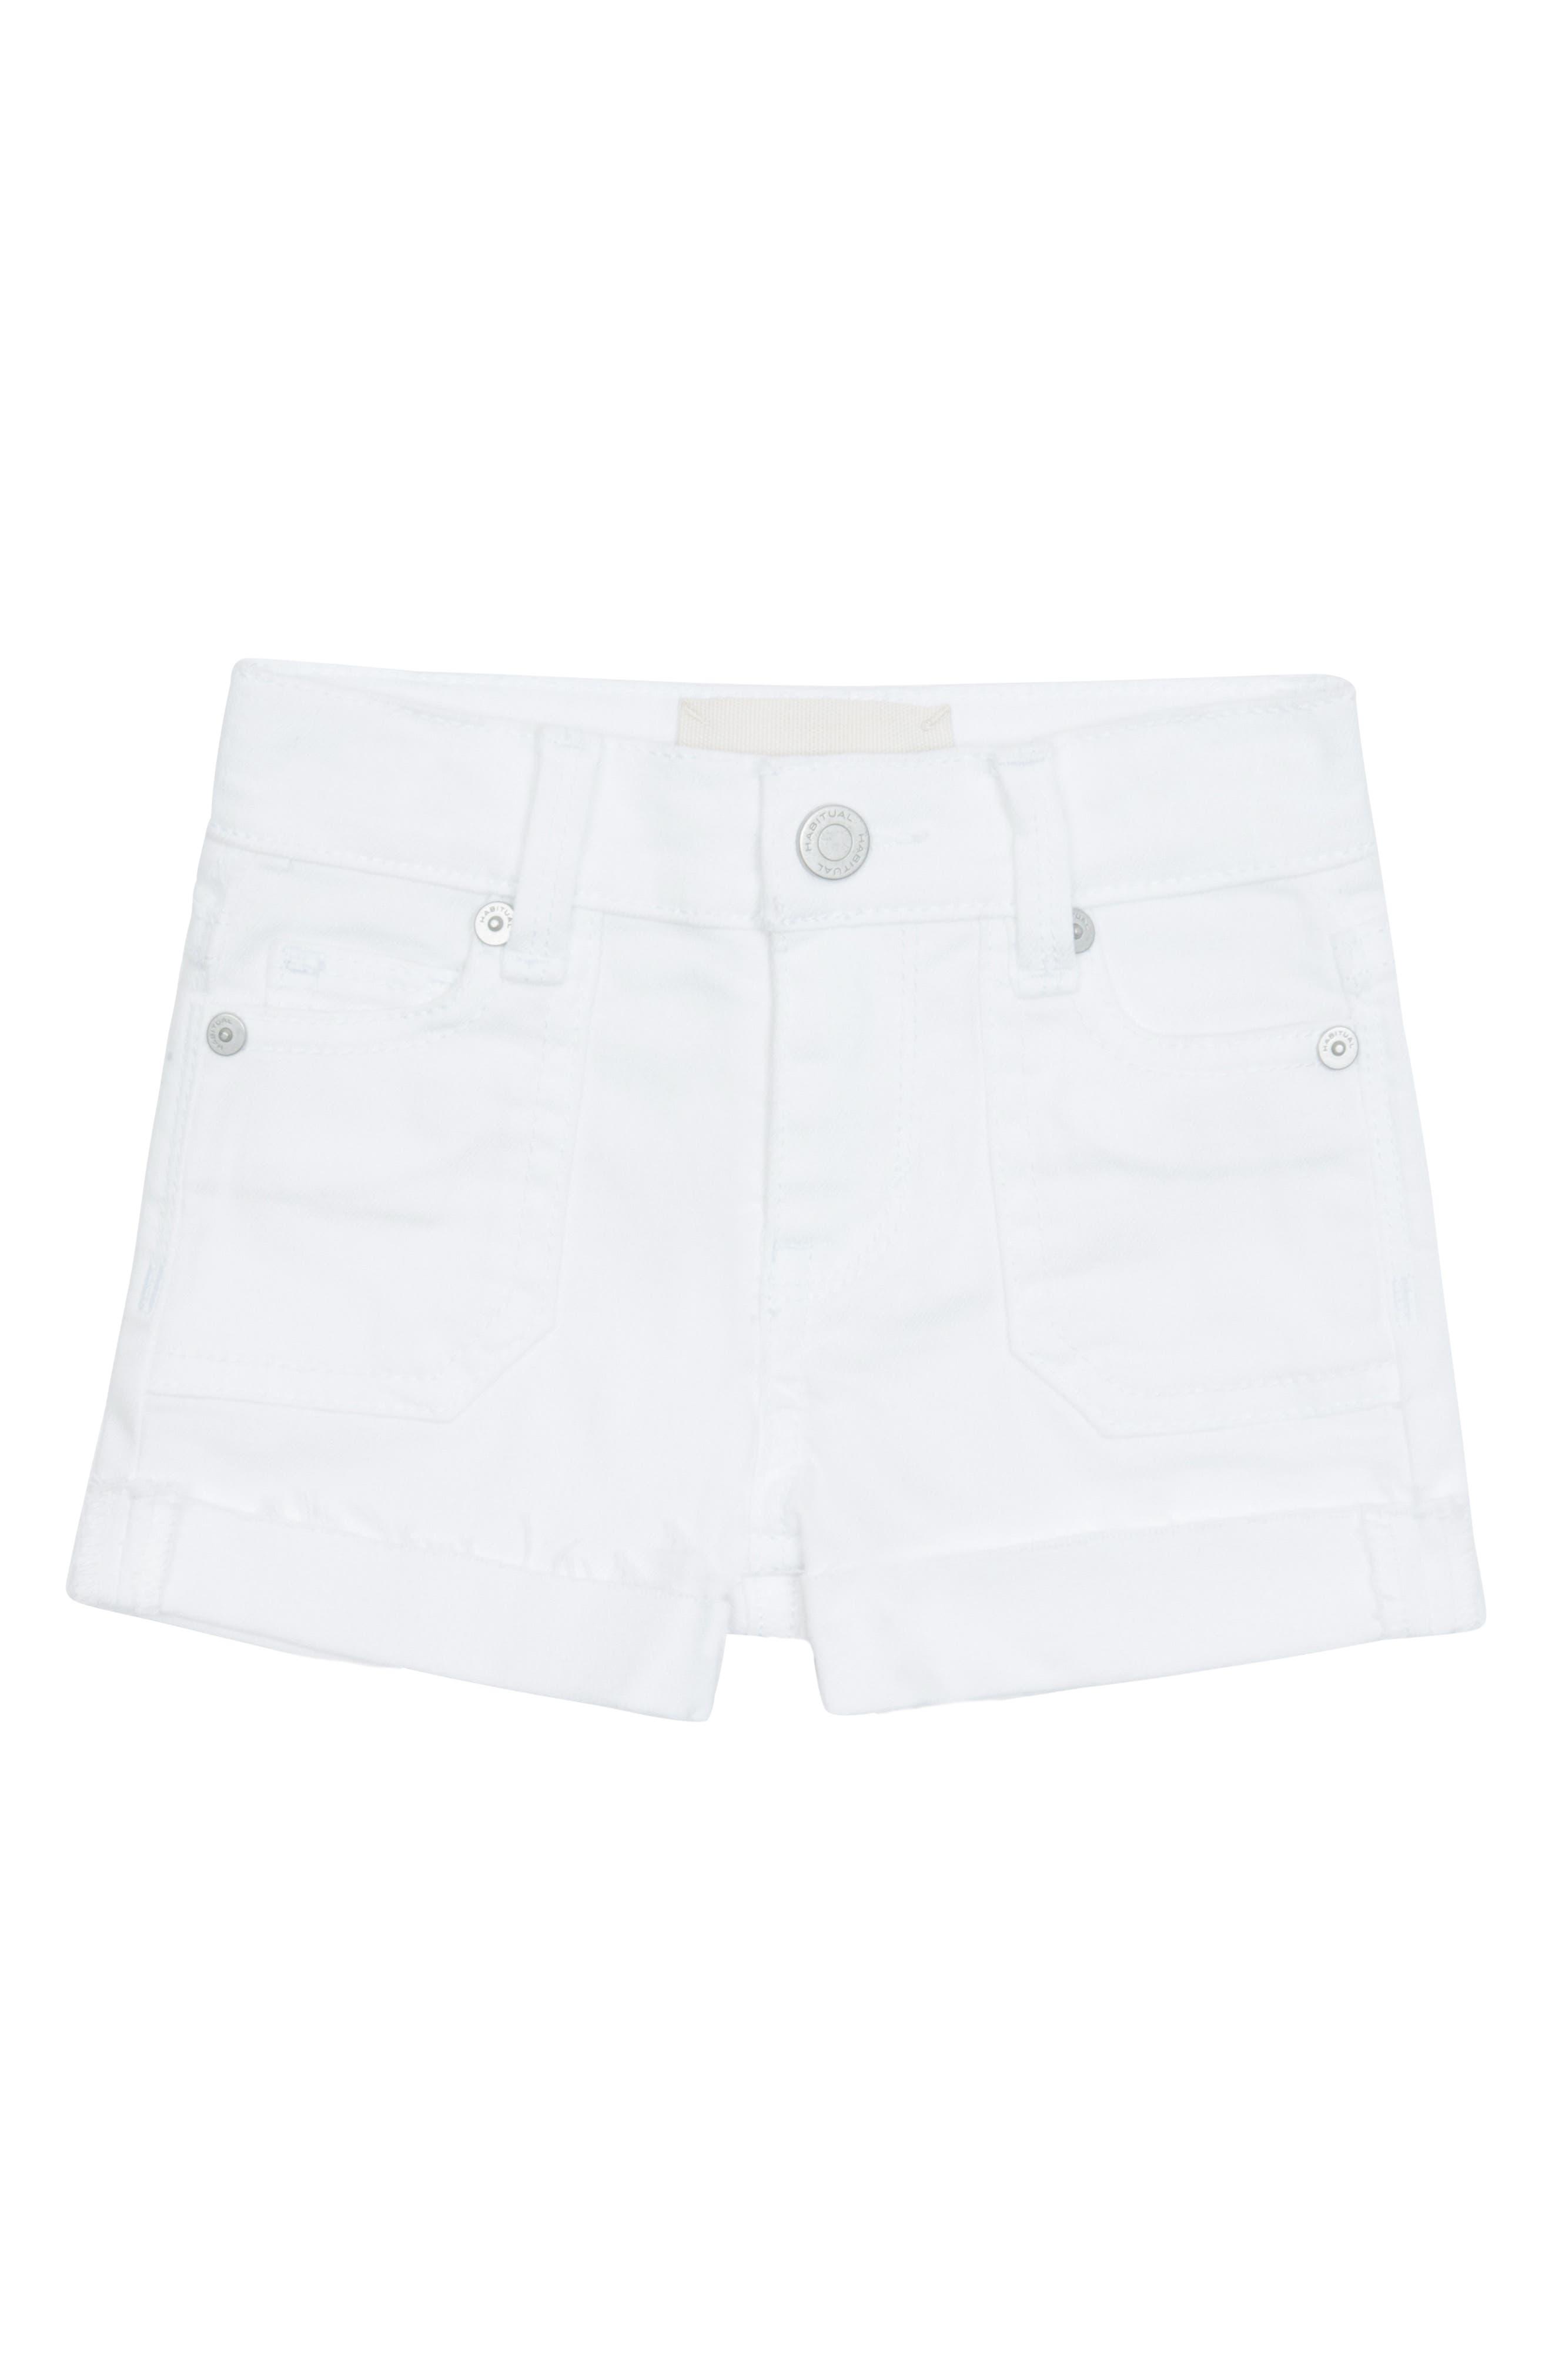 Toddler Girls Habitual Girl Thulia Frayed Cuffed Shorts Size 3T  White